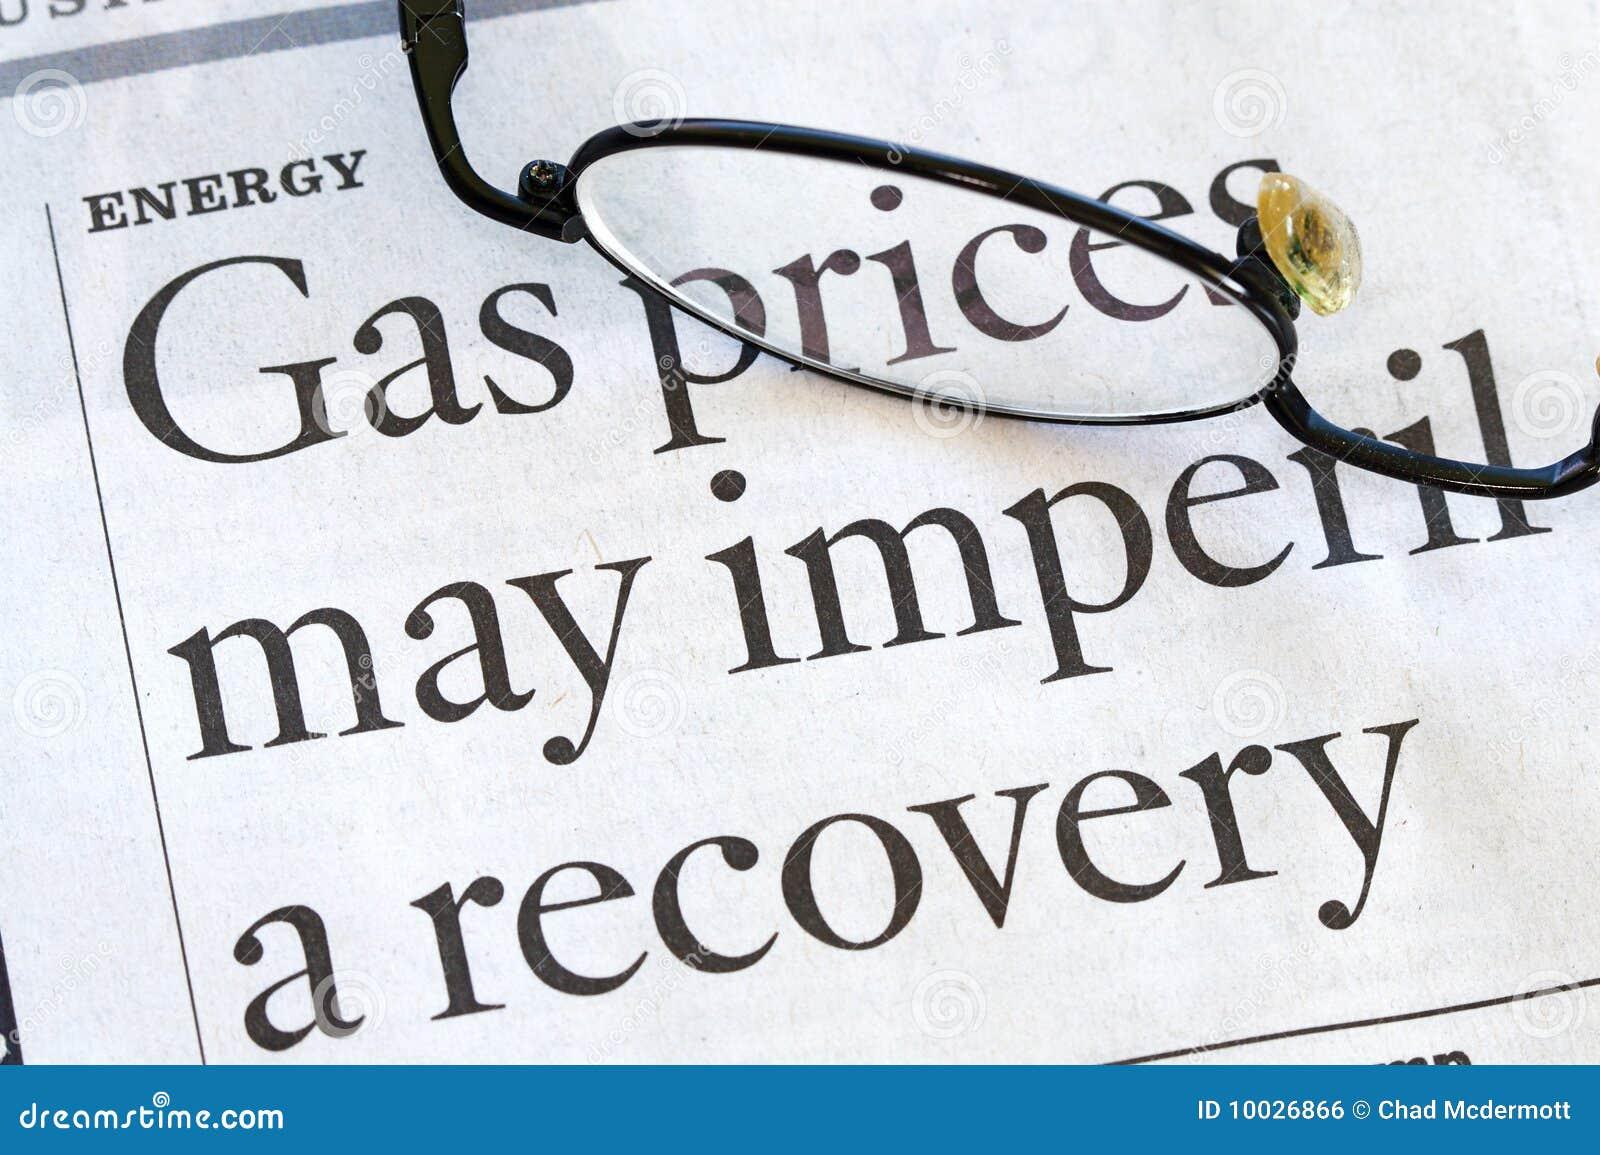 Costs energi